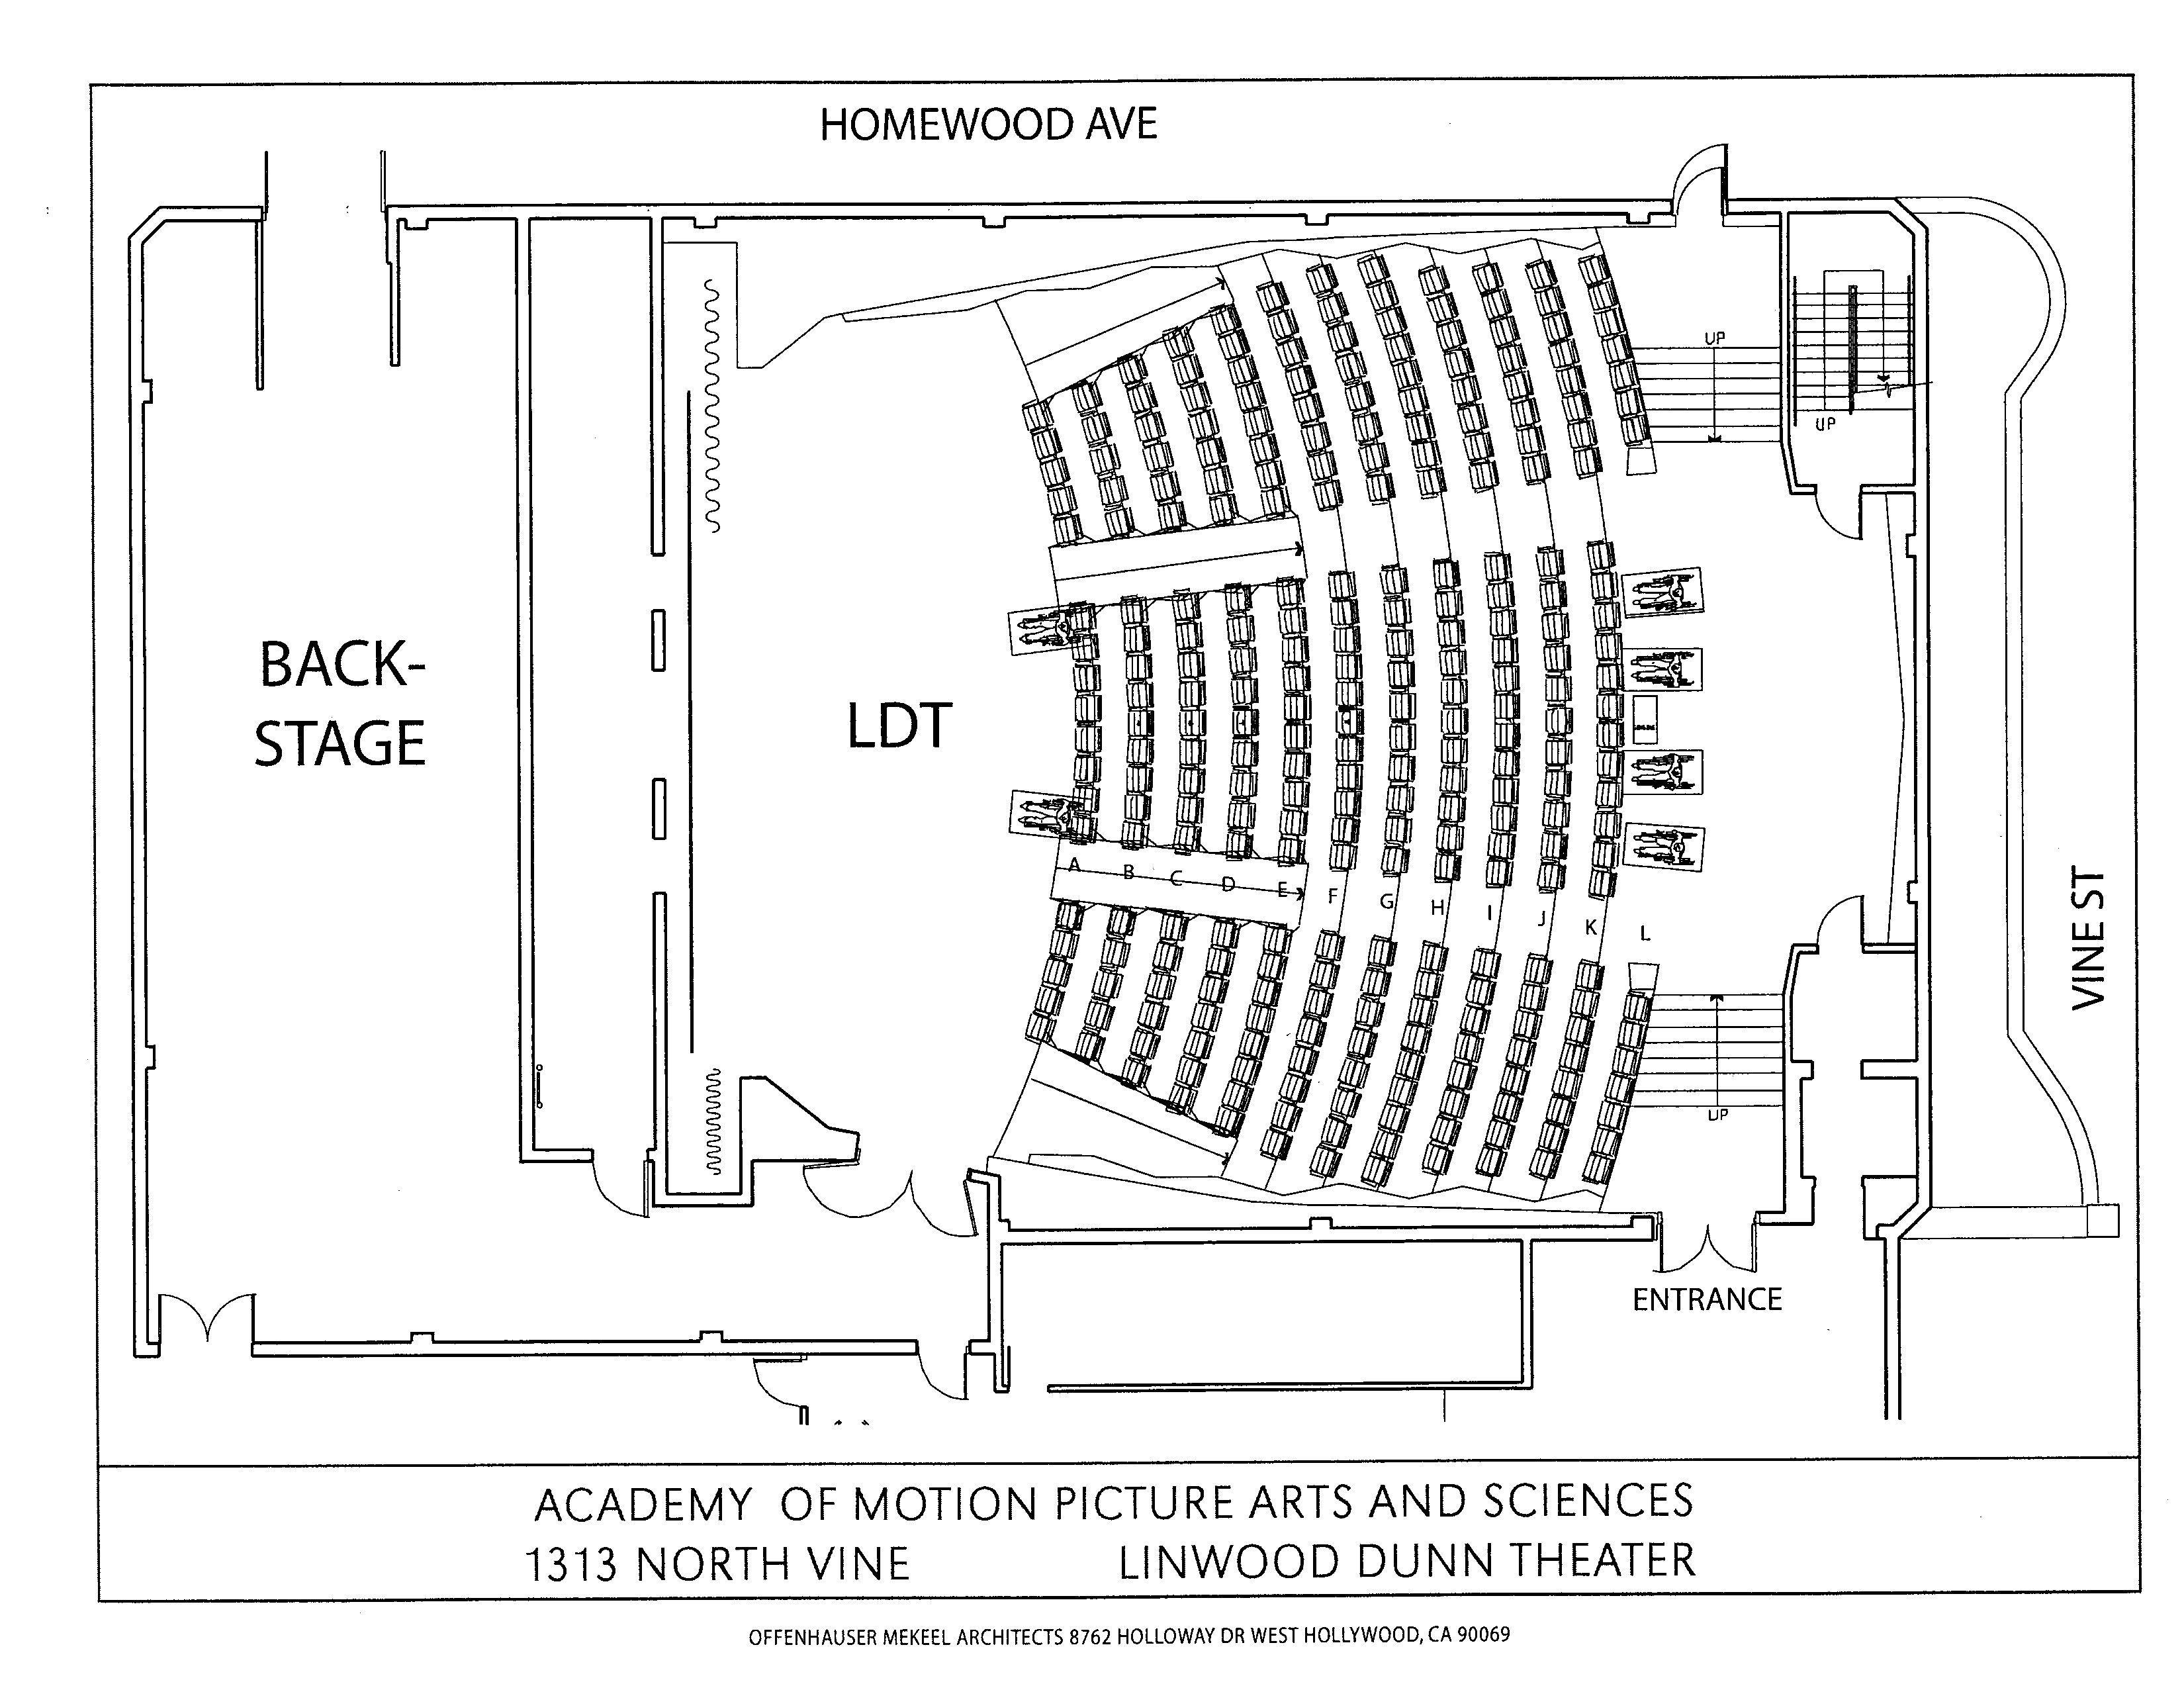 Linwood Dunn Theater Floor Plan